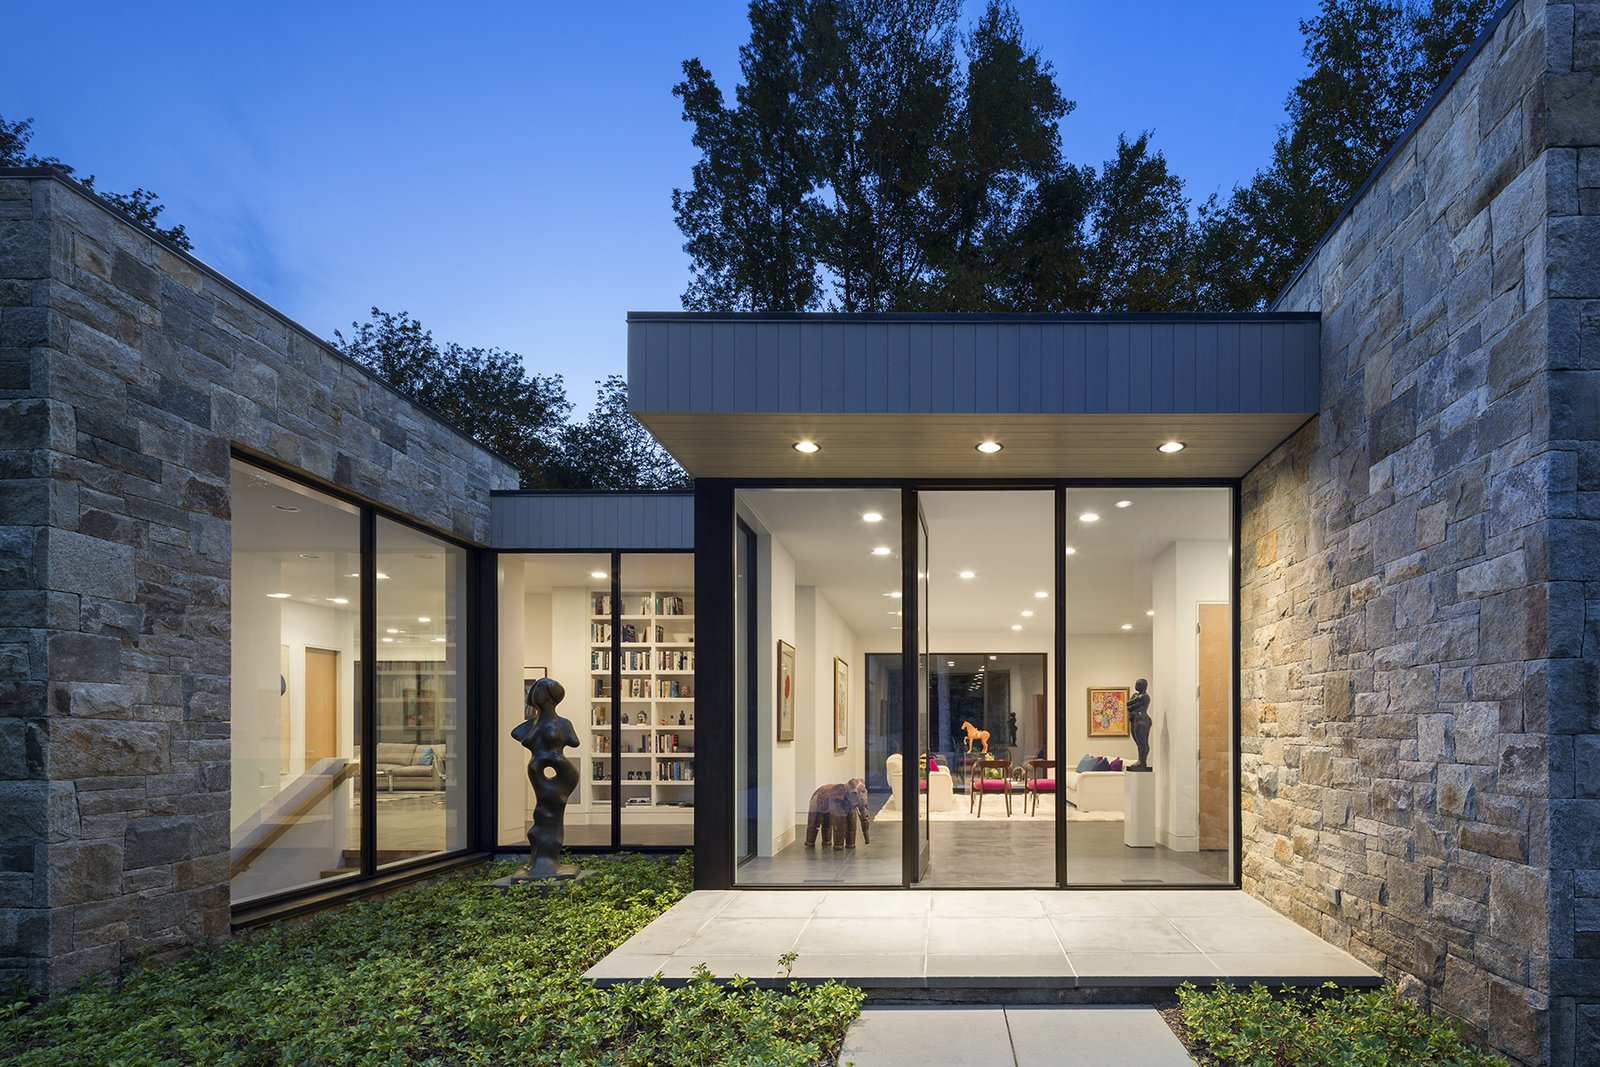 Art House 2.0 Exterior: Main Entrance with Sculpture Garden  Art House 2.0